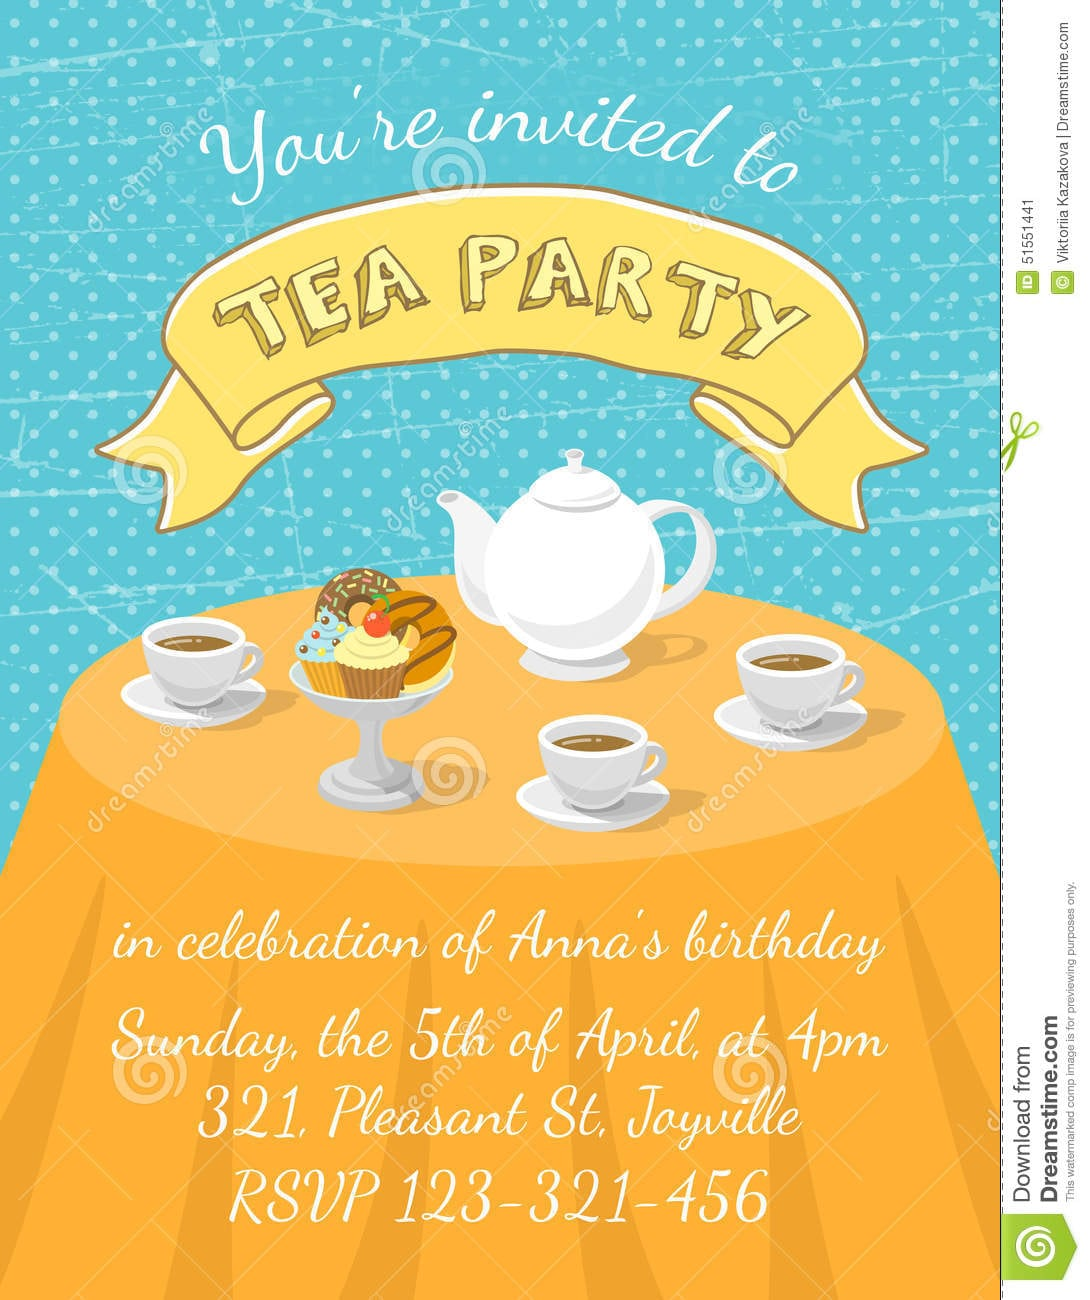 Dessert Party Invitations